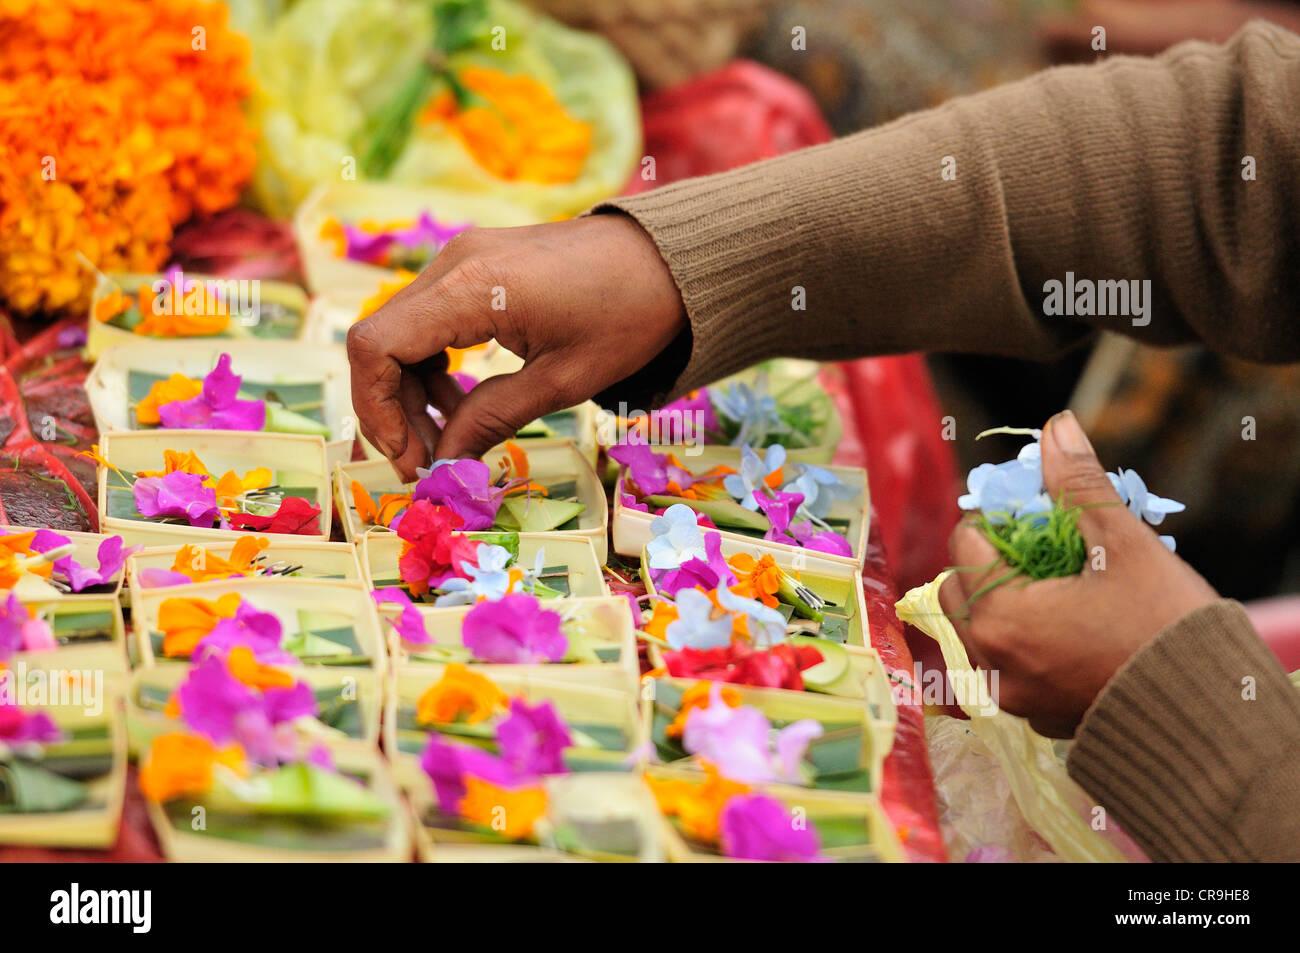 Balinese offerings flowers, Tegallalang market, Ubud, Bali, Indonesia, Asia - Stock Image